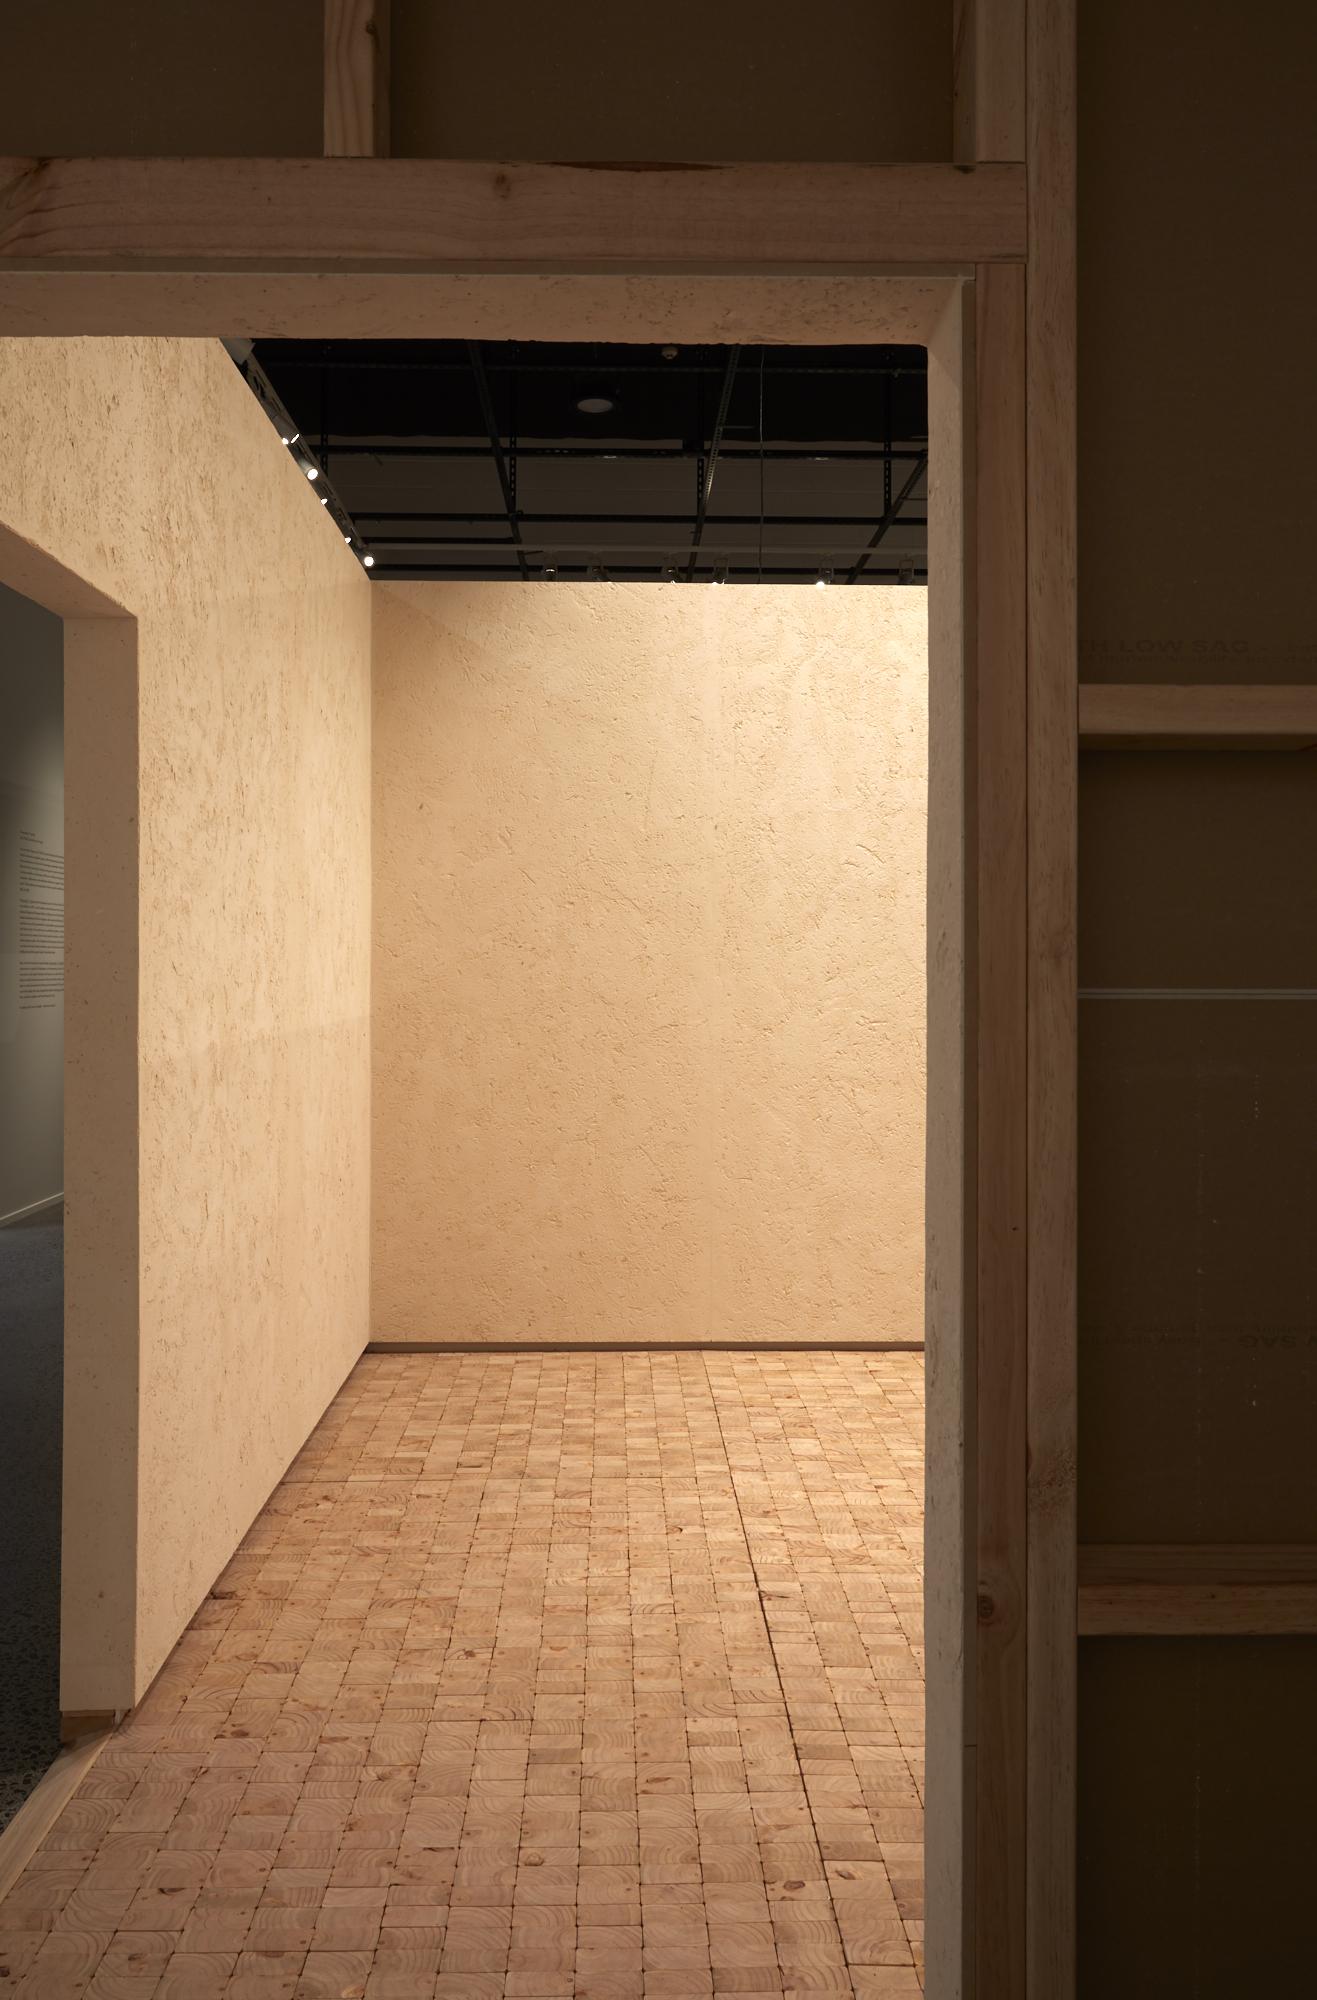 Rufus Knight and Mijntje Lepoutre, Untitled (Presque Rien), The Room, 2019, Objectspace. Image: Samuel Hartnett